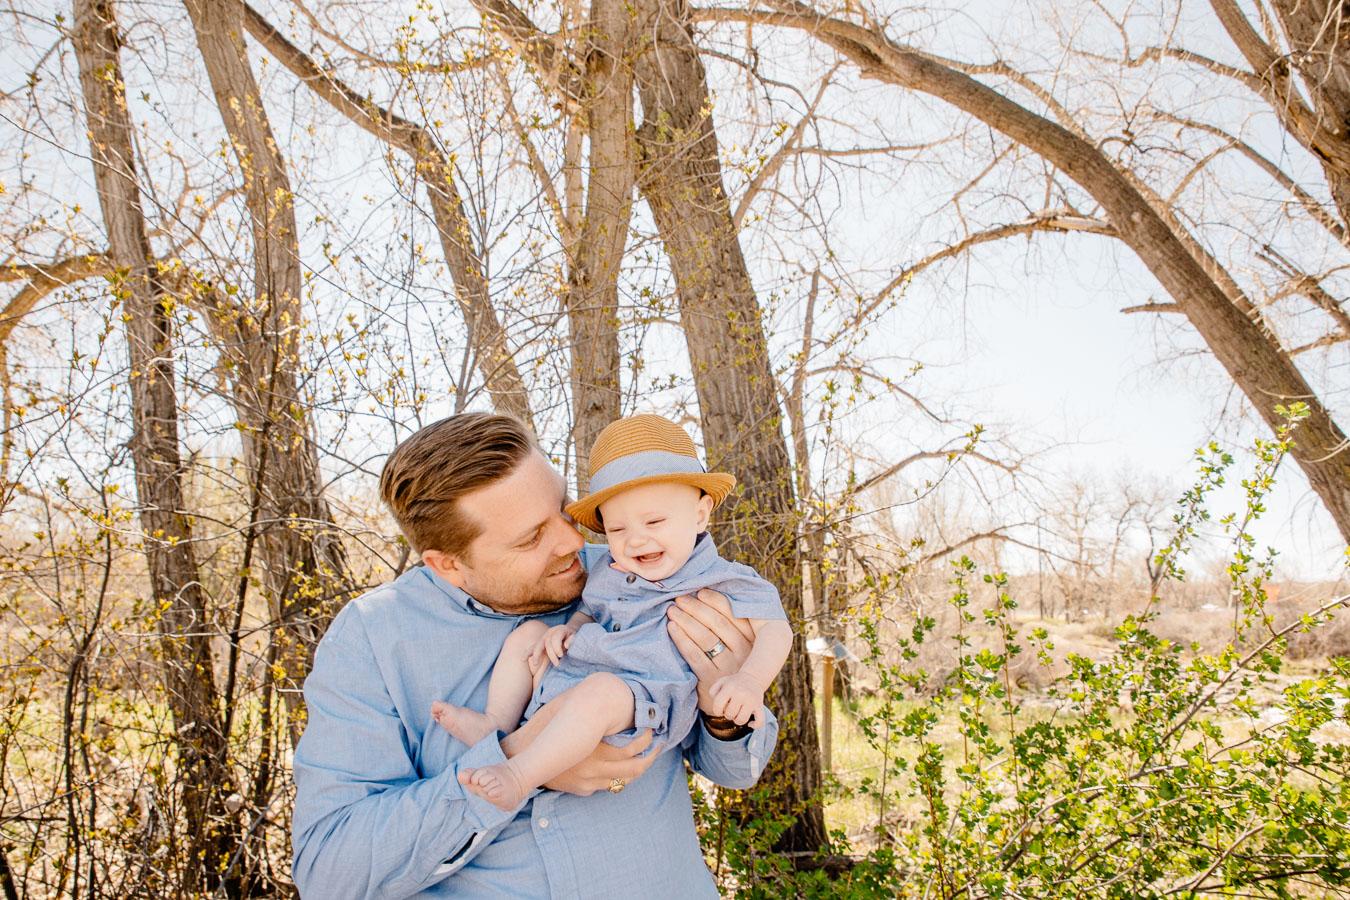 18-Schulz-April-Denver-Family-Lifestyle-Photographer-046.jpg